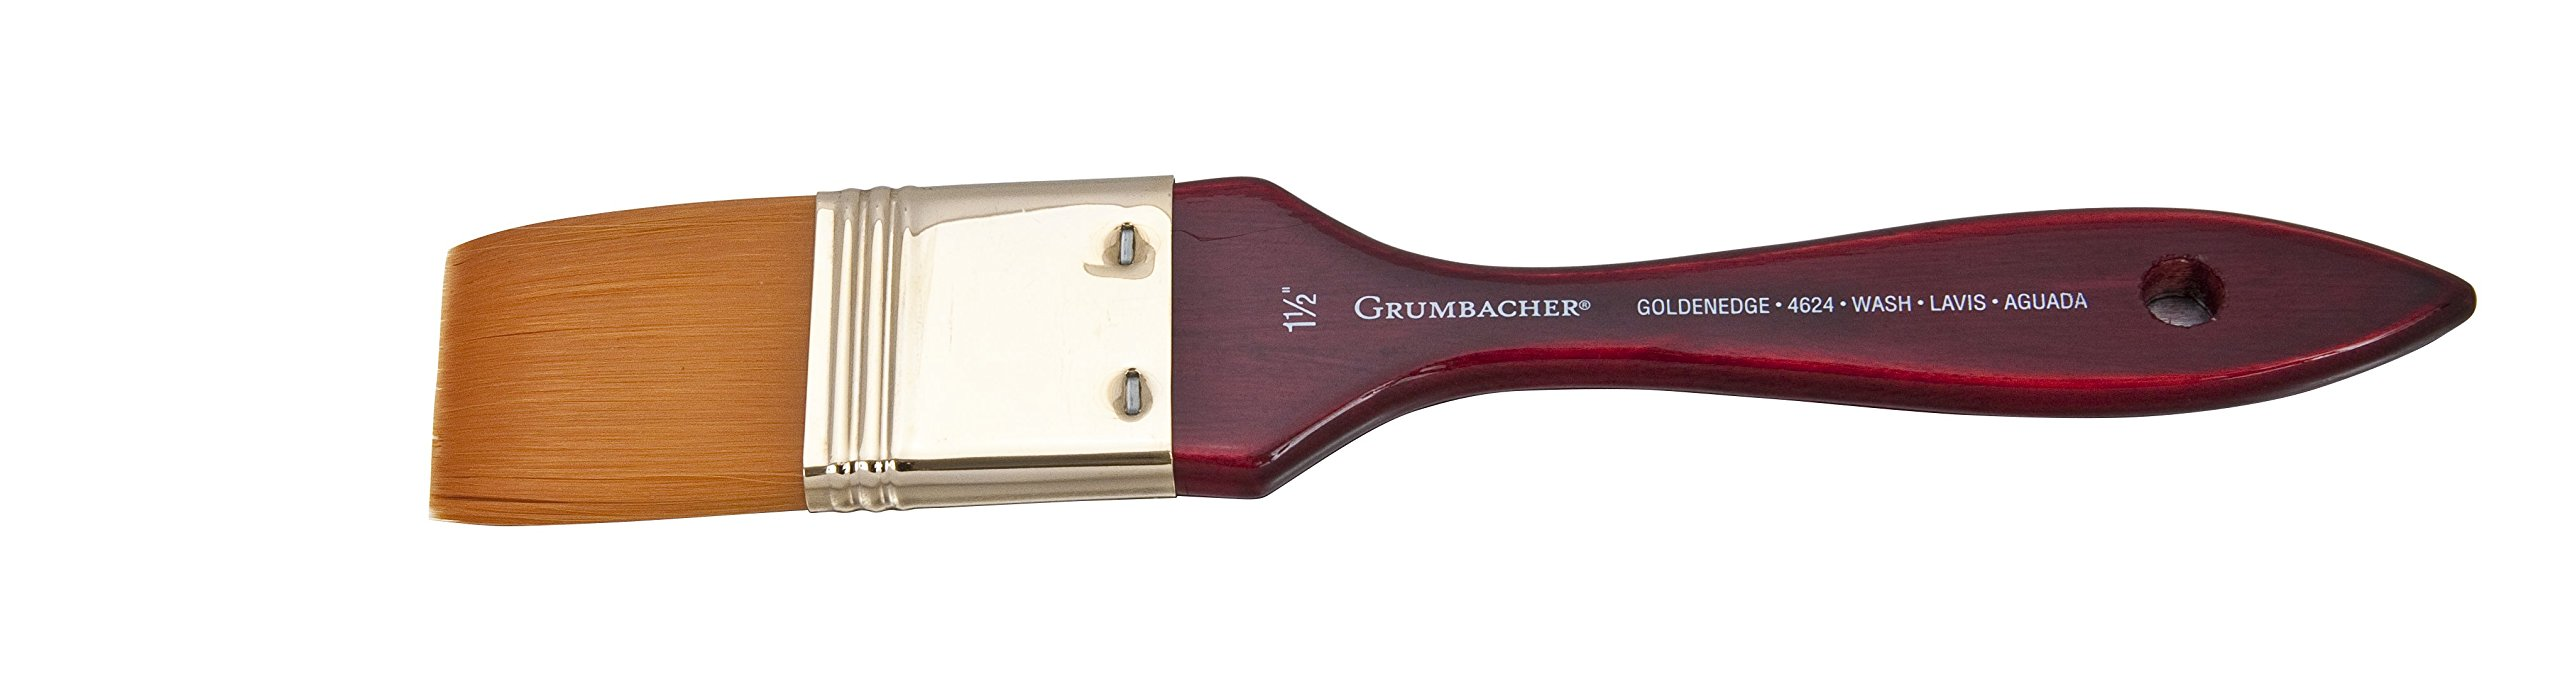 Grumbacher Goldenedge Golden Toray Wash Watercolor Brush, Synthetic Bristles, Size 1-1/2'' (4624.150) by GRUMBACHER